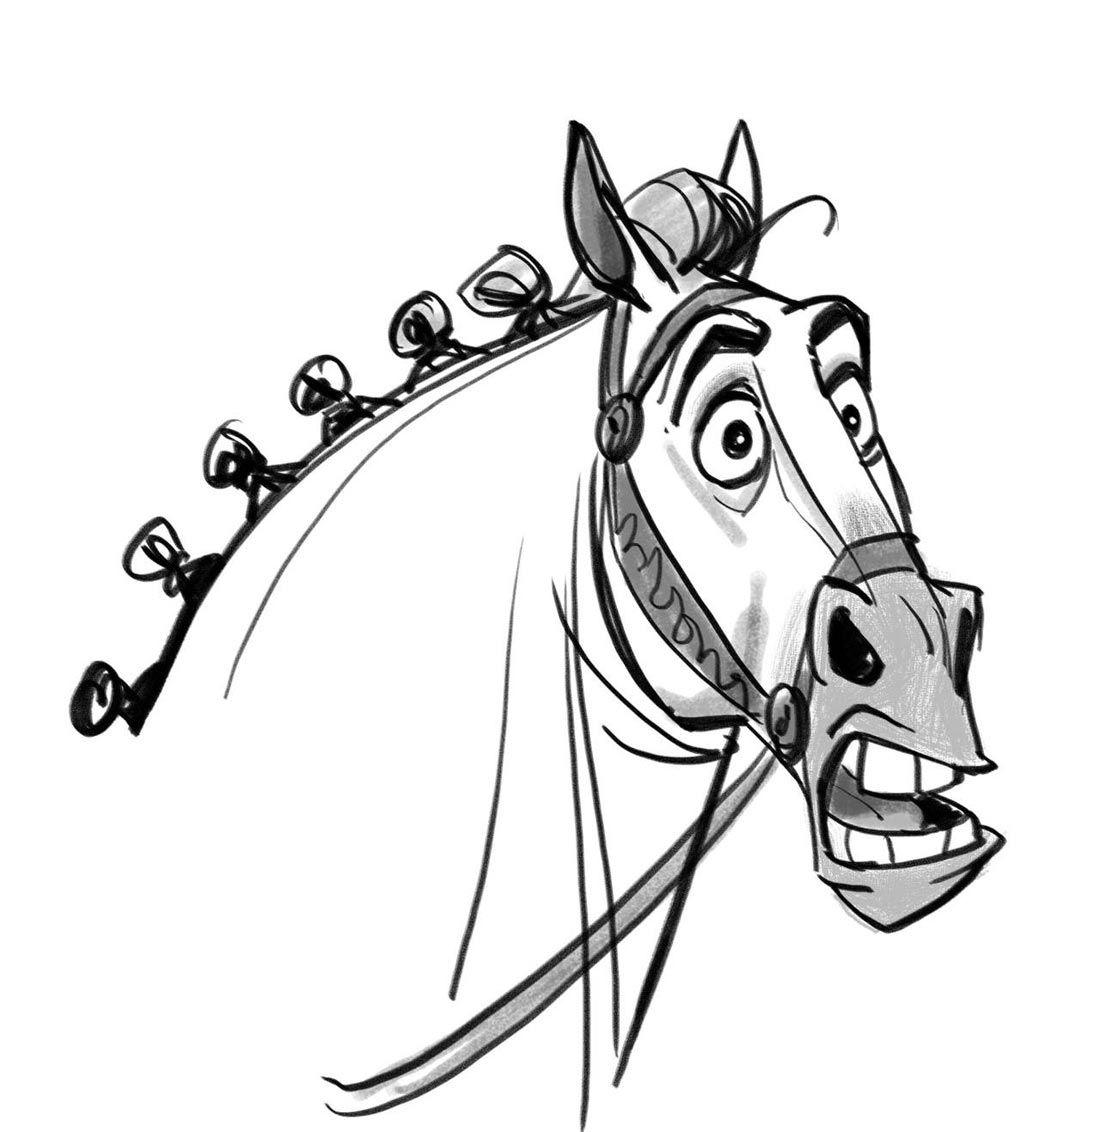 Пасху, смешные рисунки лошадок